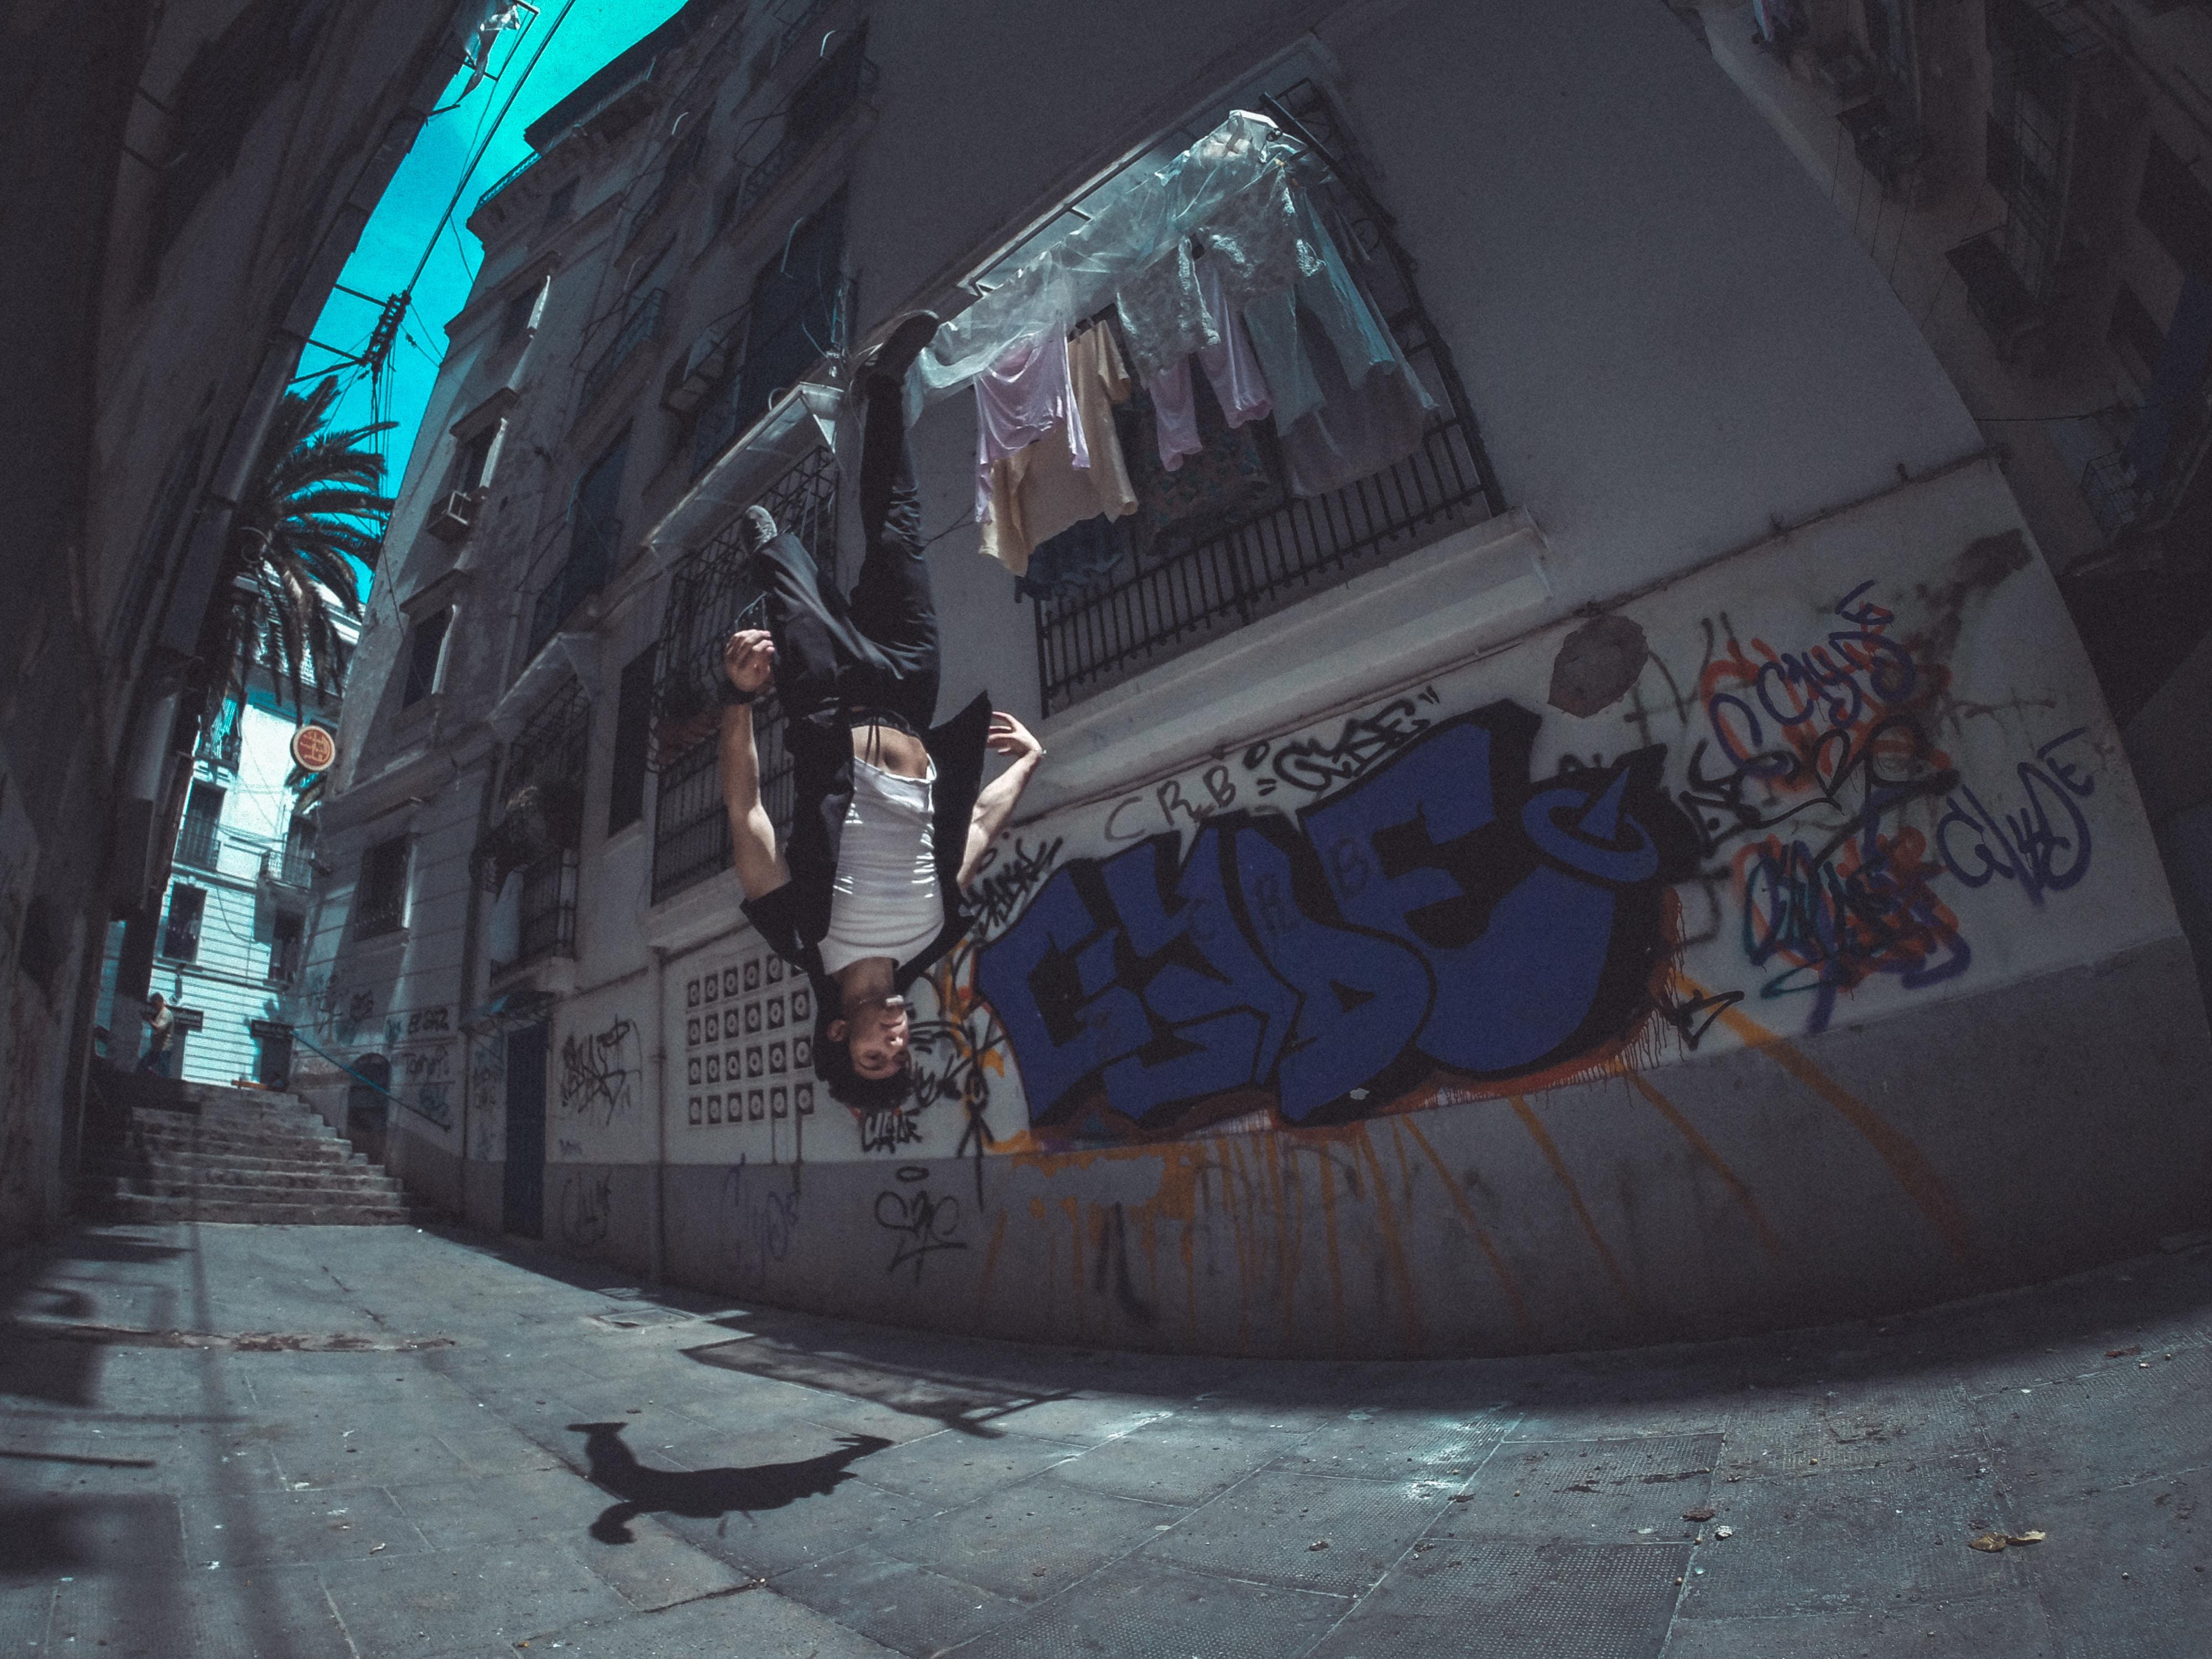 man performing backflip between house